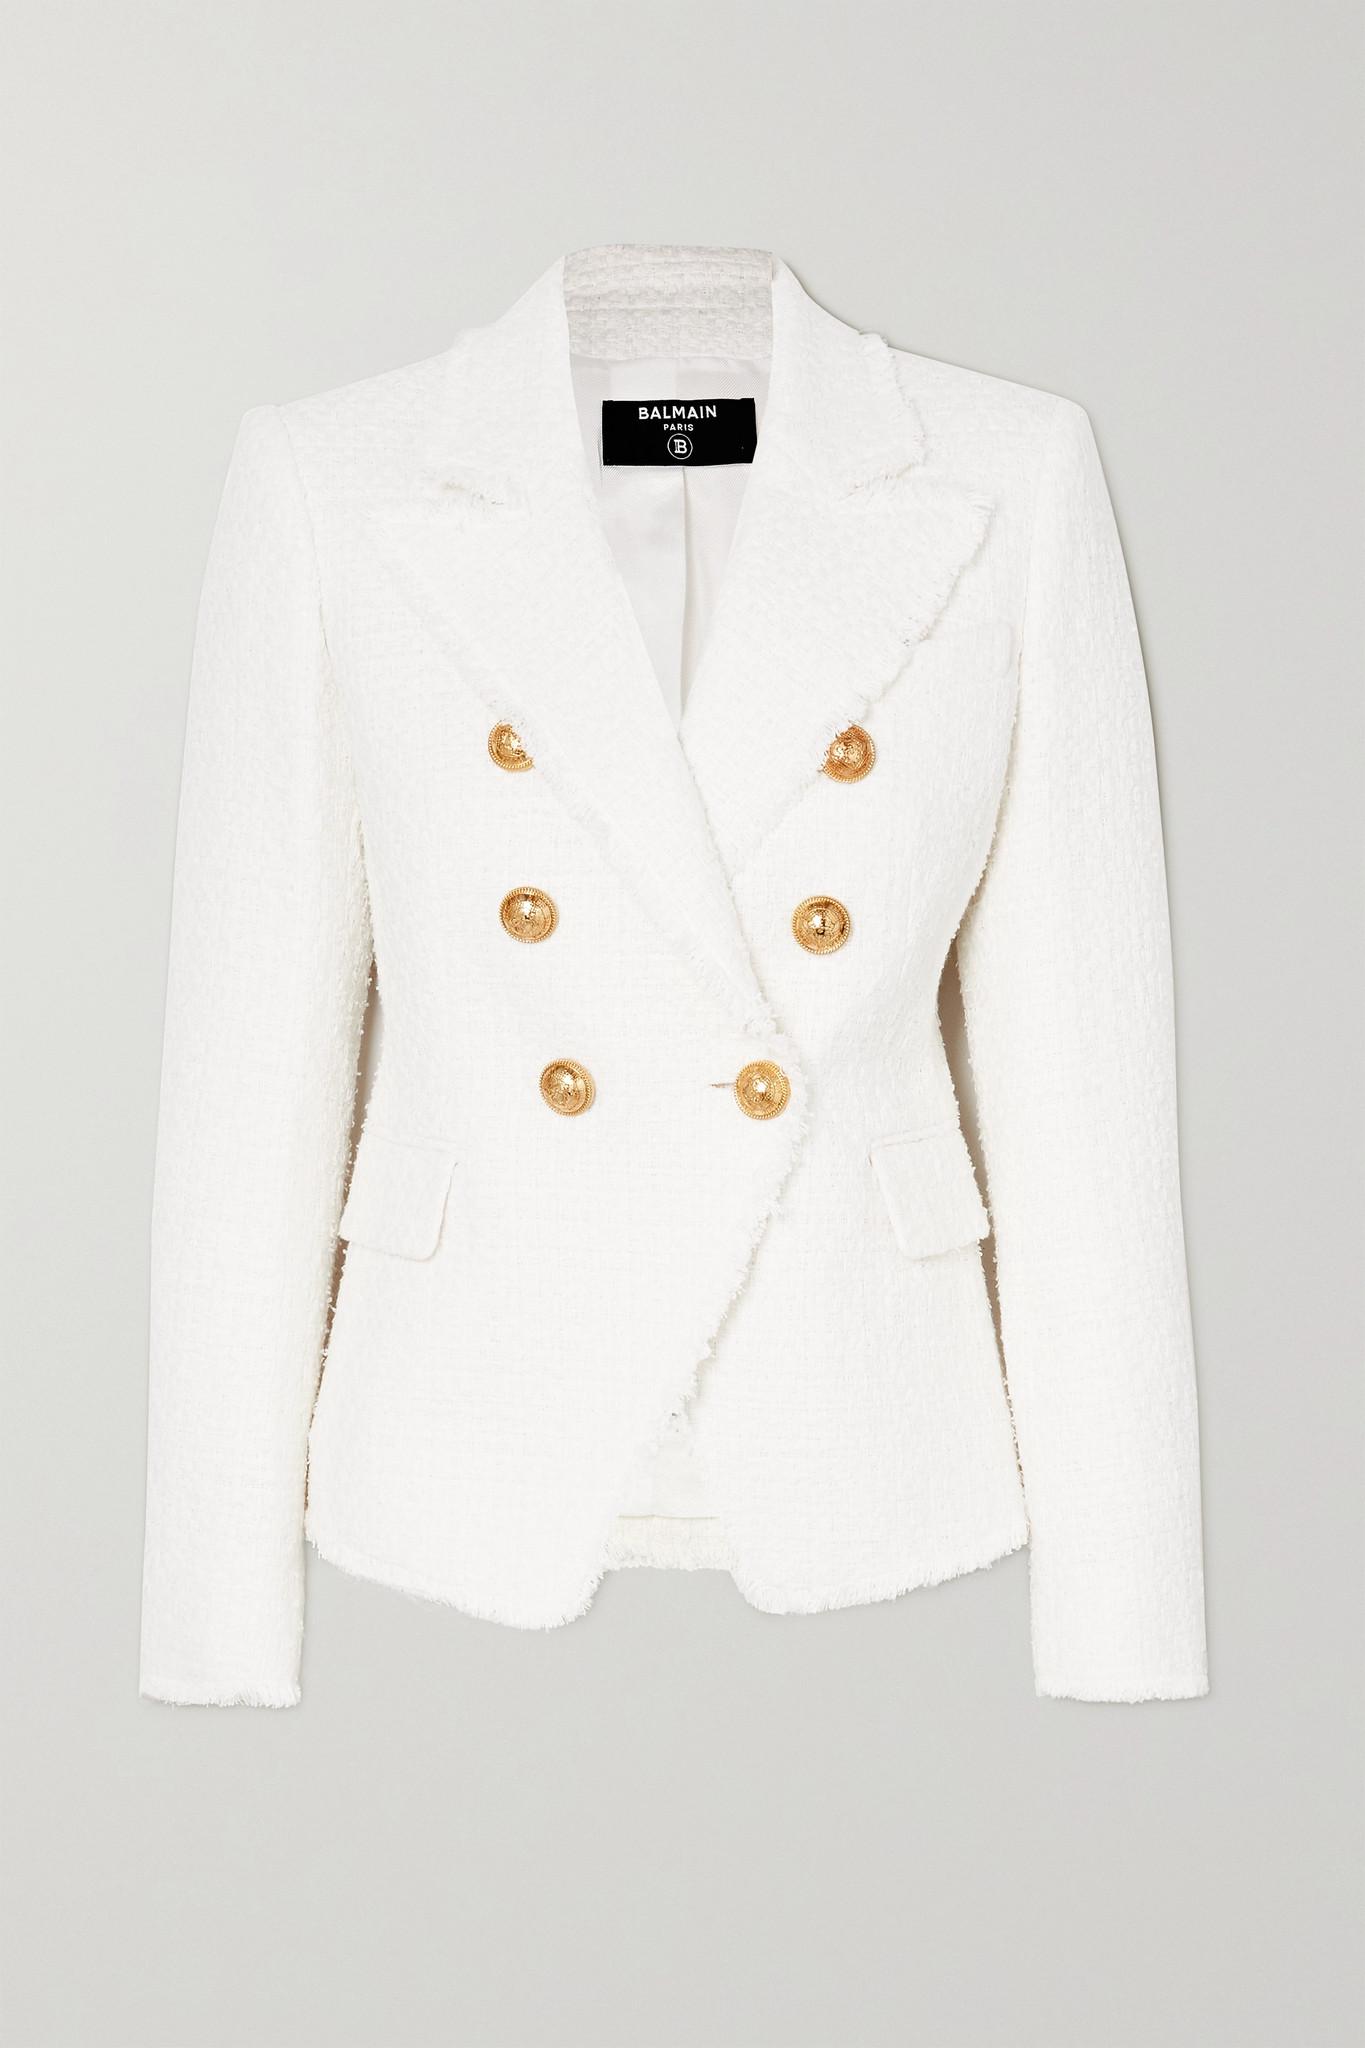 BALMAIN - 双排扣棉质混纺花呢西装外套 - 白色 - FR36